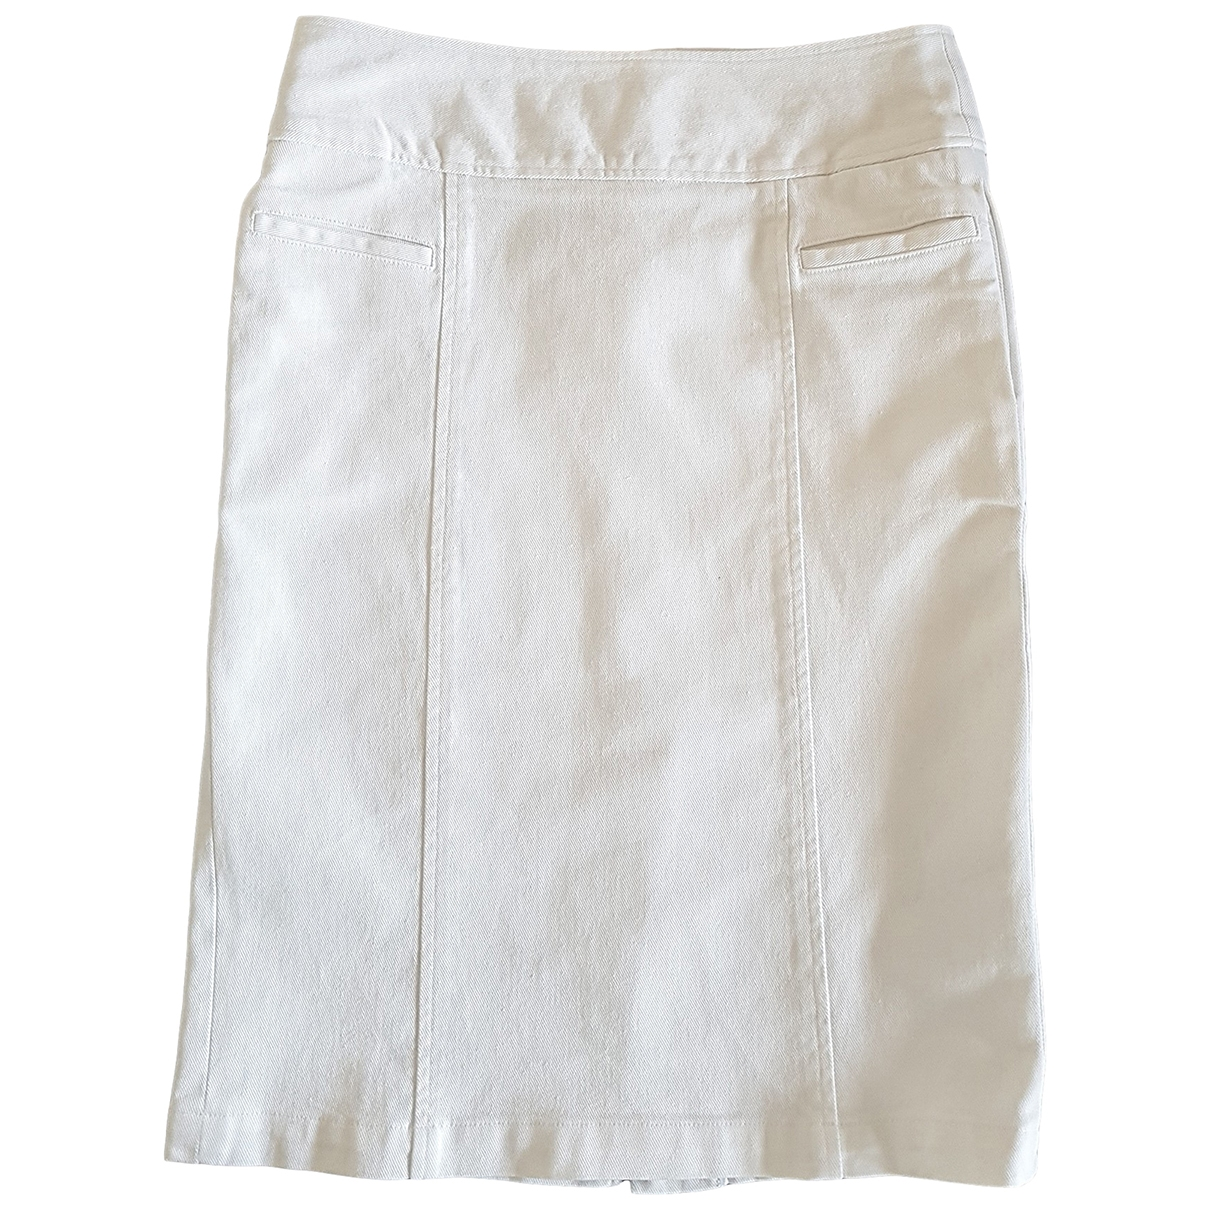 Freda \N White Cotton - elasthane skirt for Women 8 US